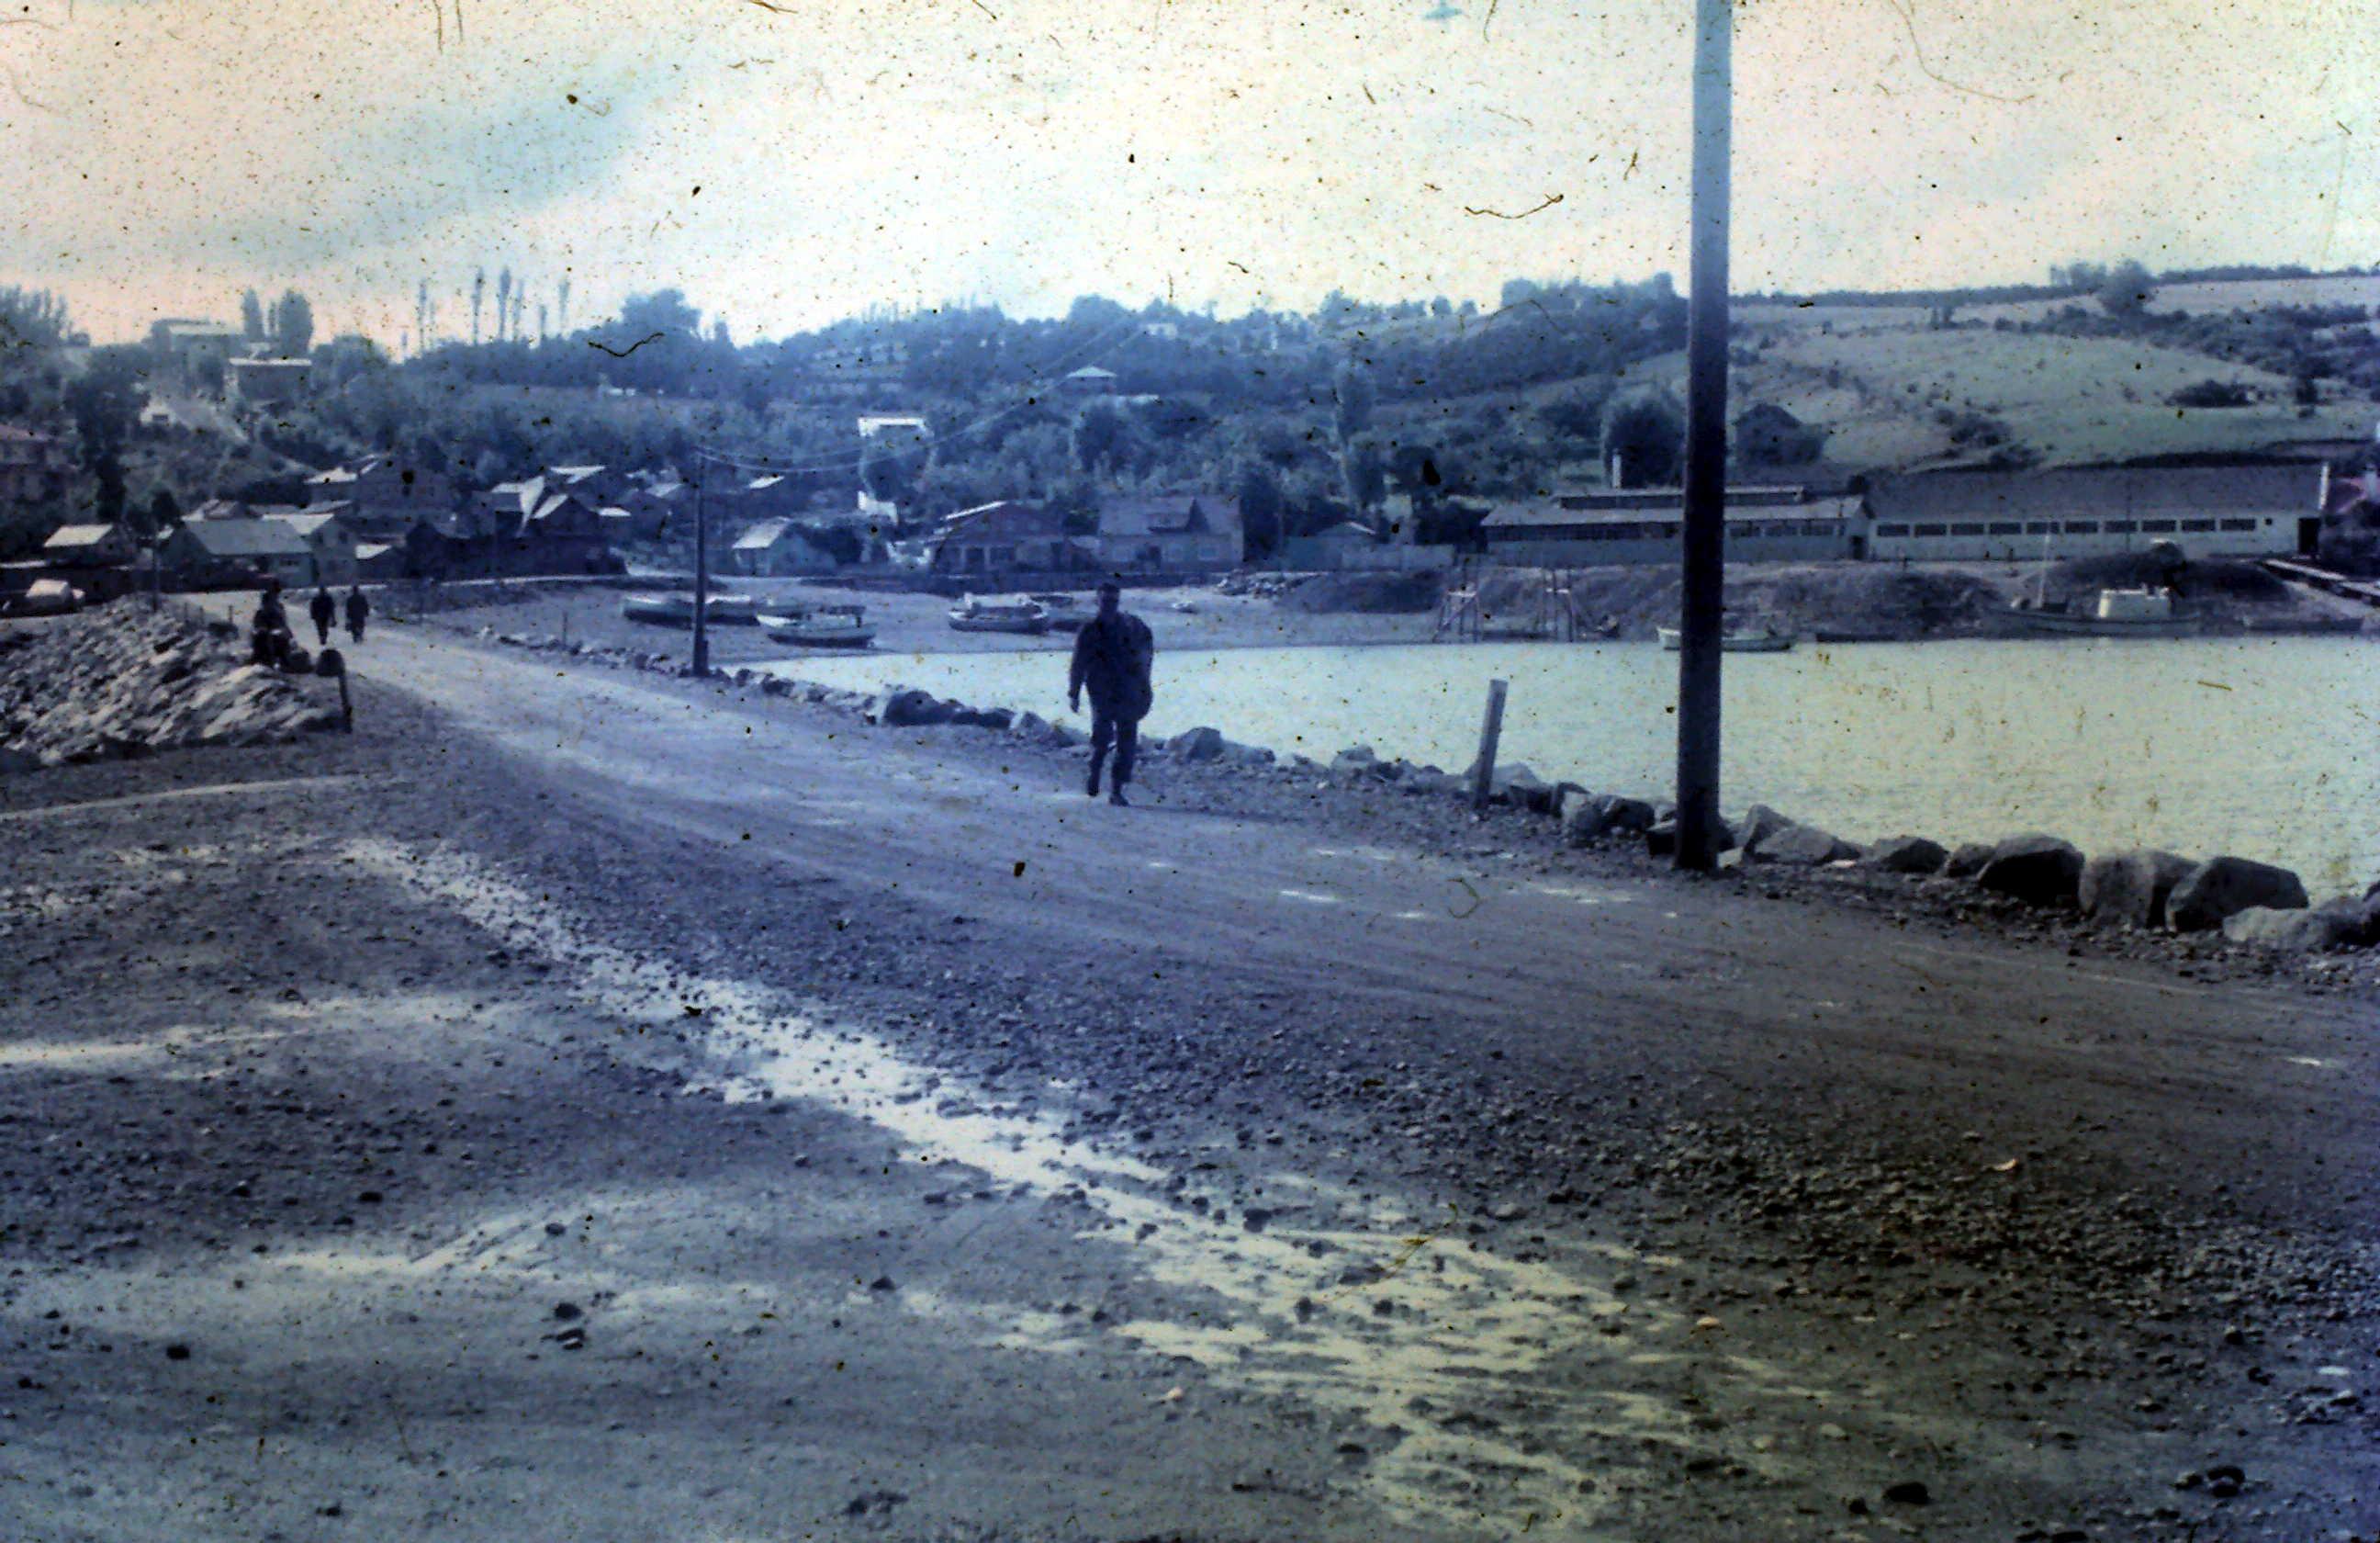 Enterreno - Fotos históricas de chile - fotos antiguas de Chile - Calbuco año 1968